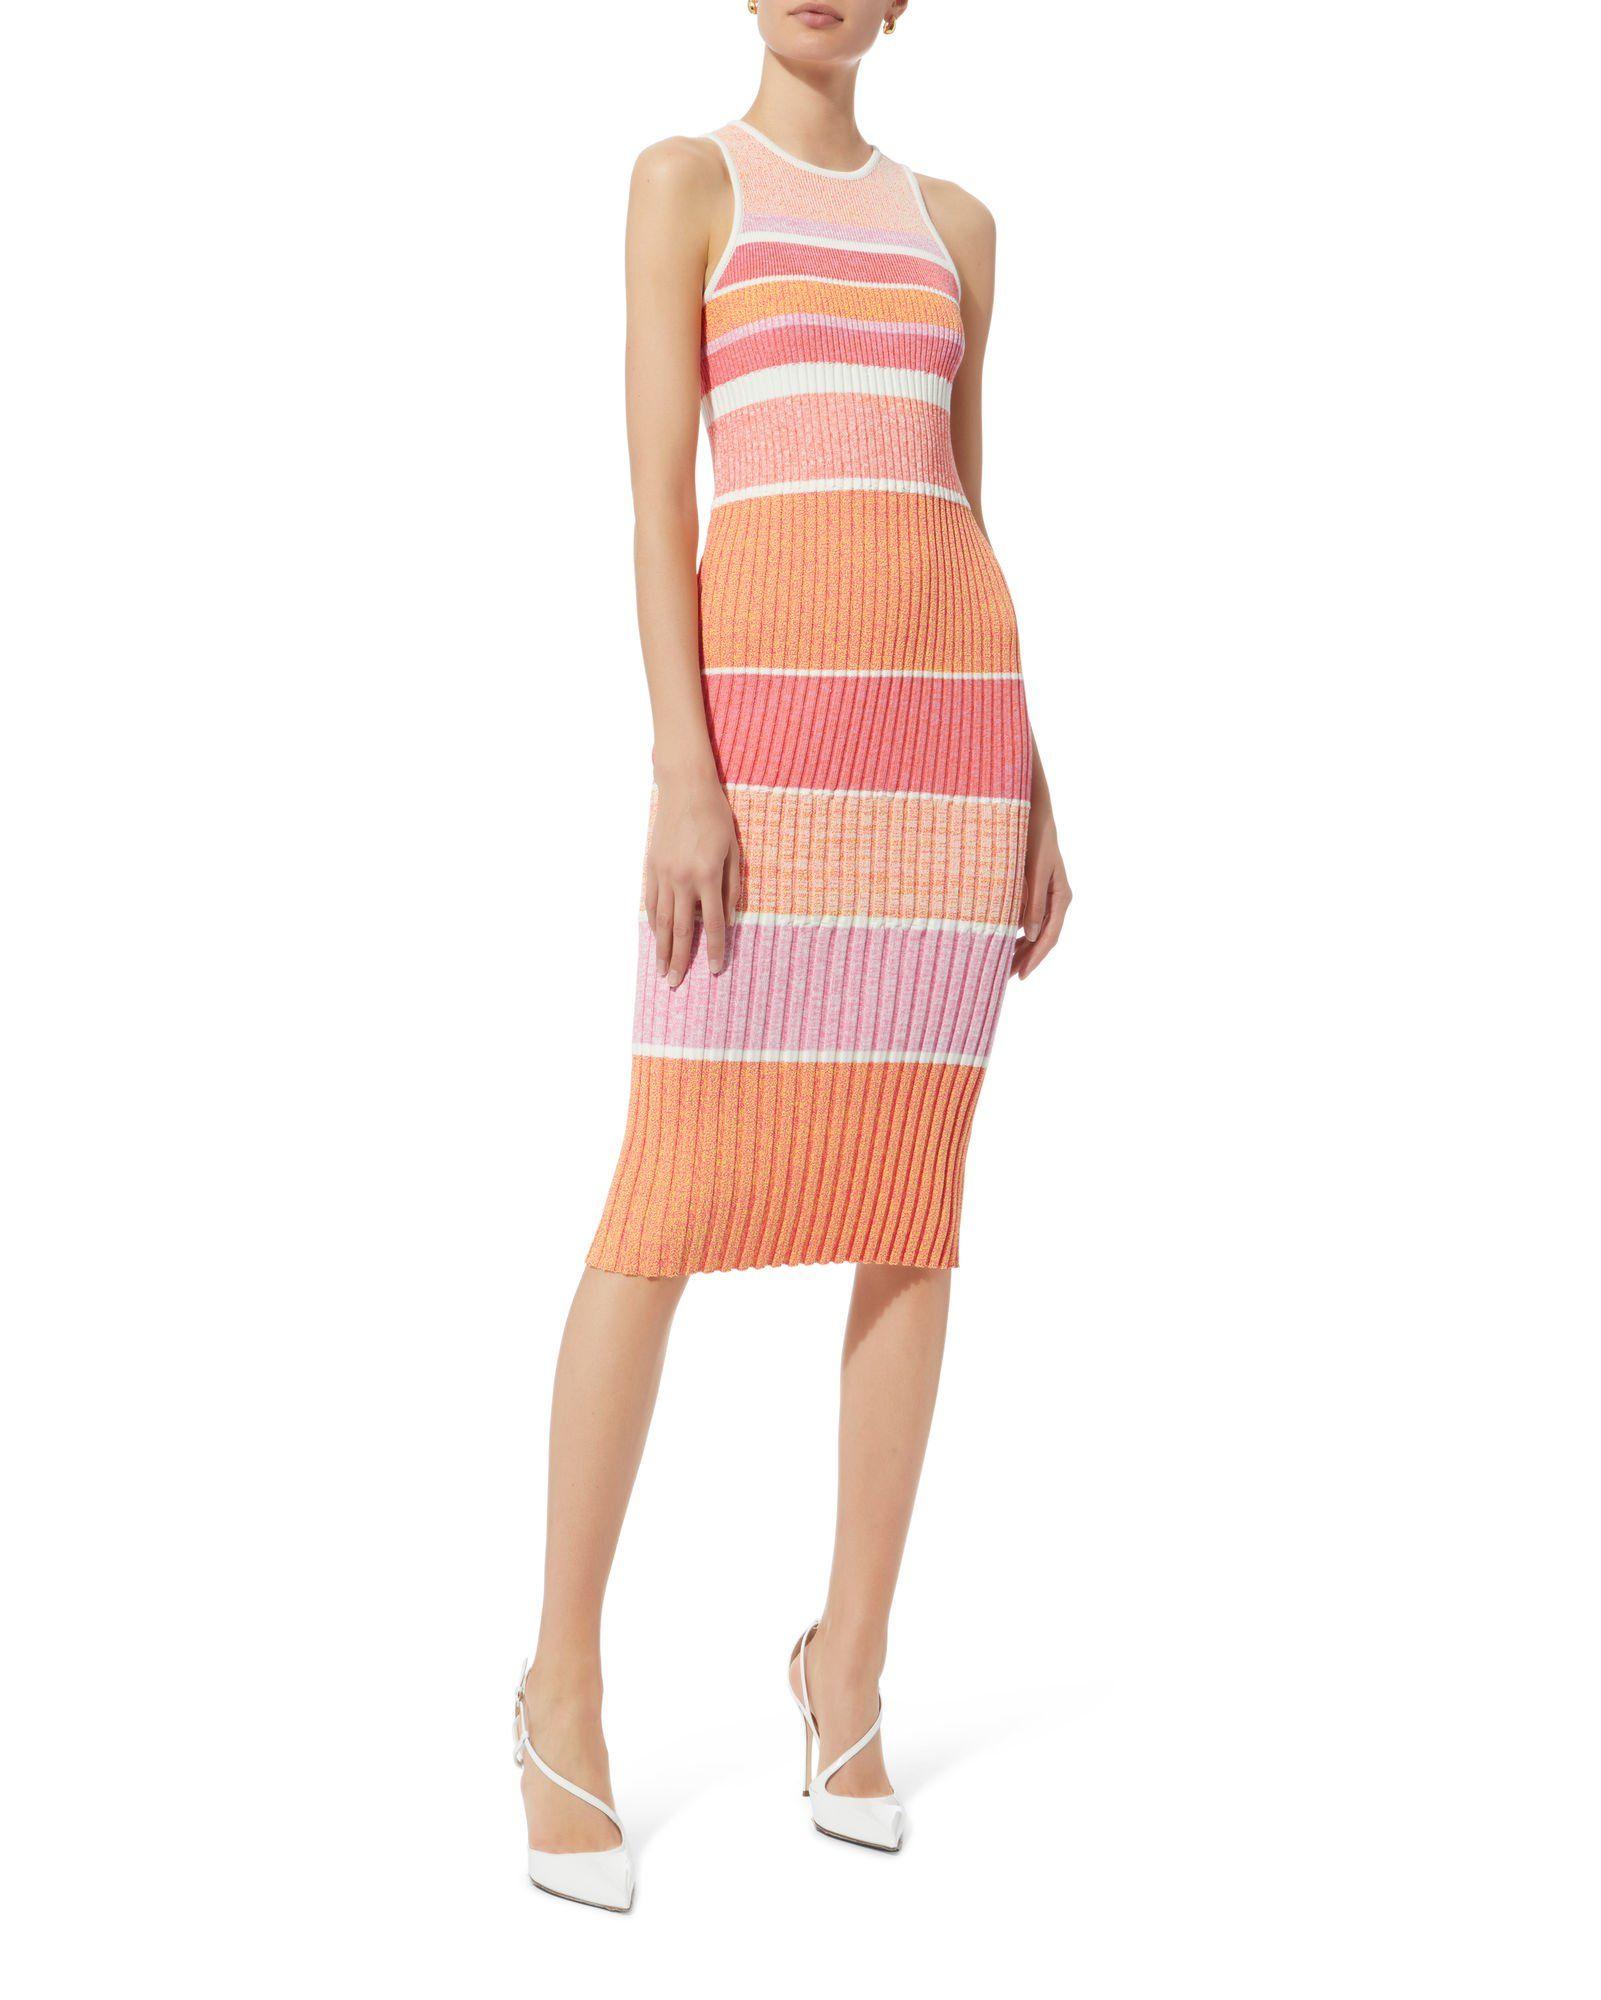 Tank Pink Stripe Knit Dress Striped Knit Striped Knit Dress Knit Dress [ 2000 x 1601 Pixel ]